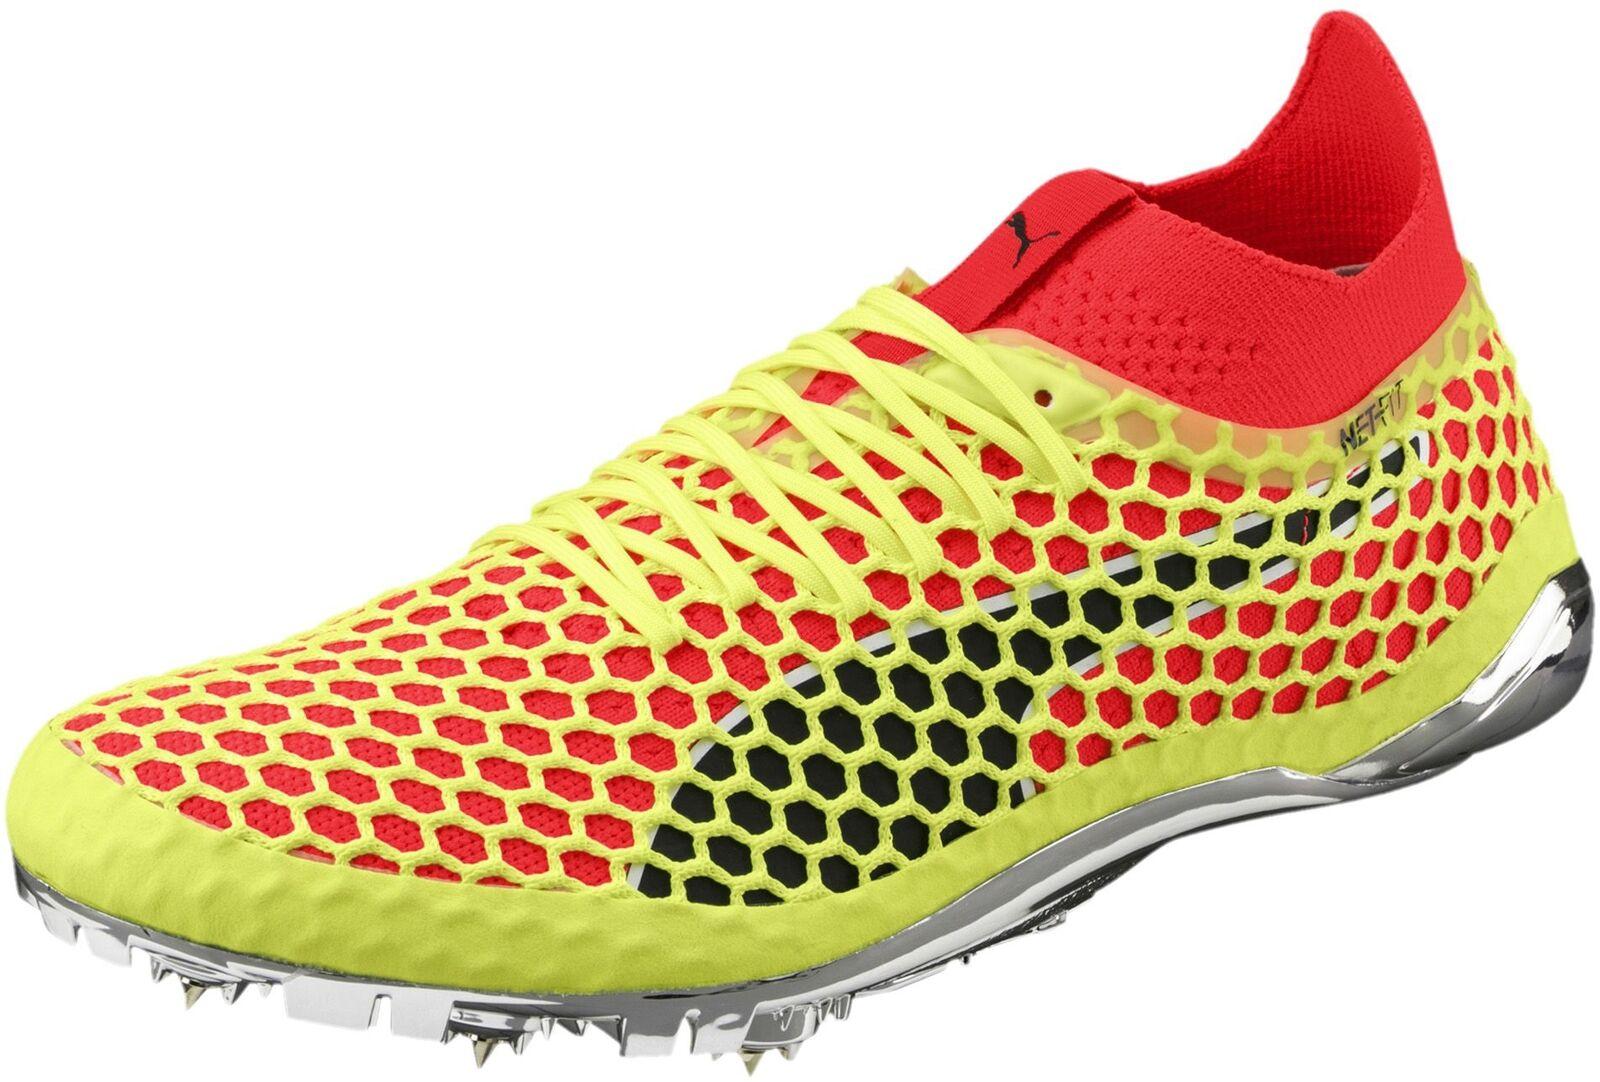 Puma evoSpeed Netfit Sprint Running Spikes - Yellow